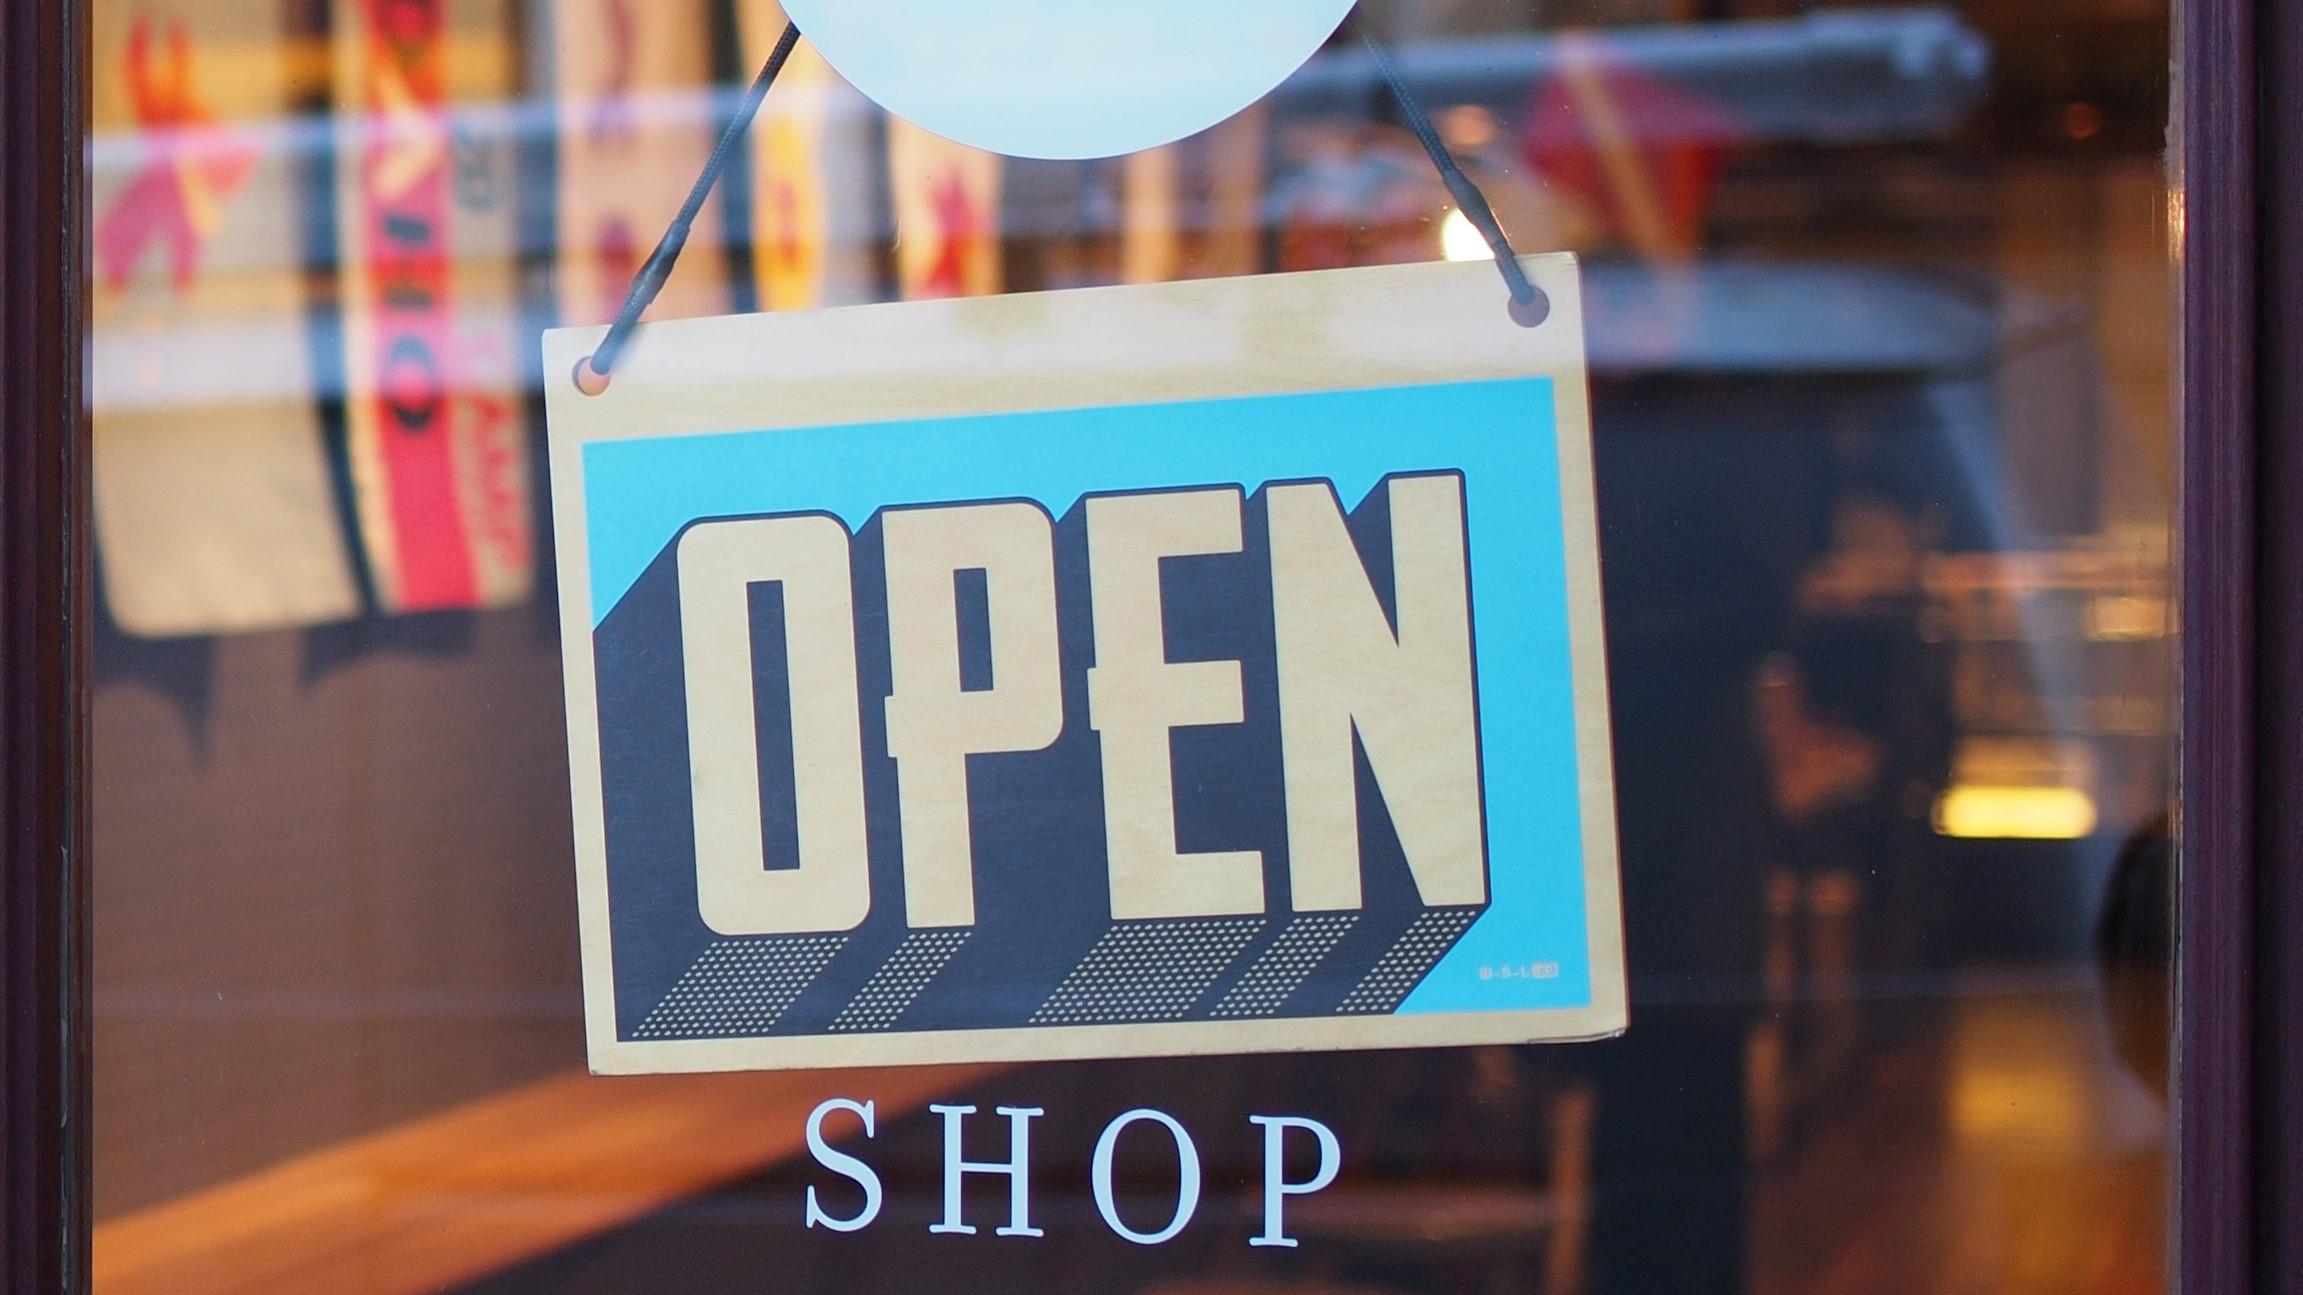 Open sign in a shop window